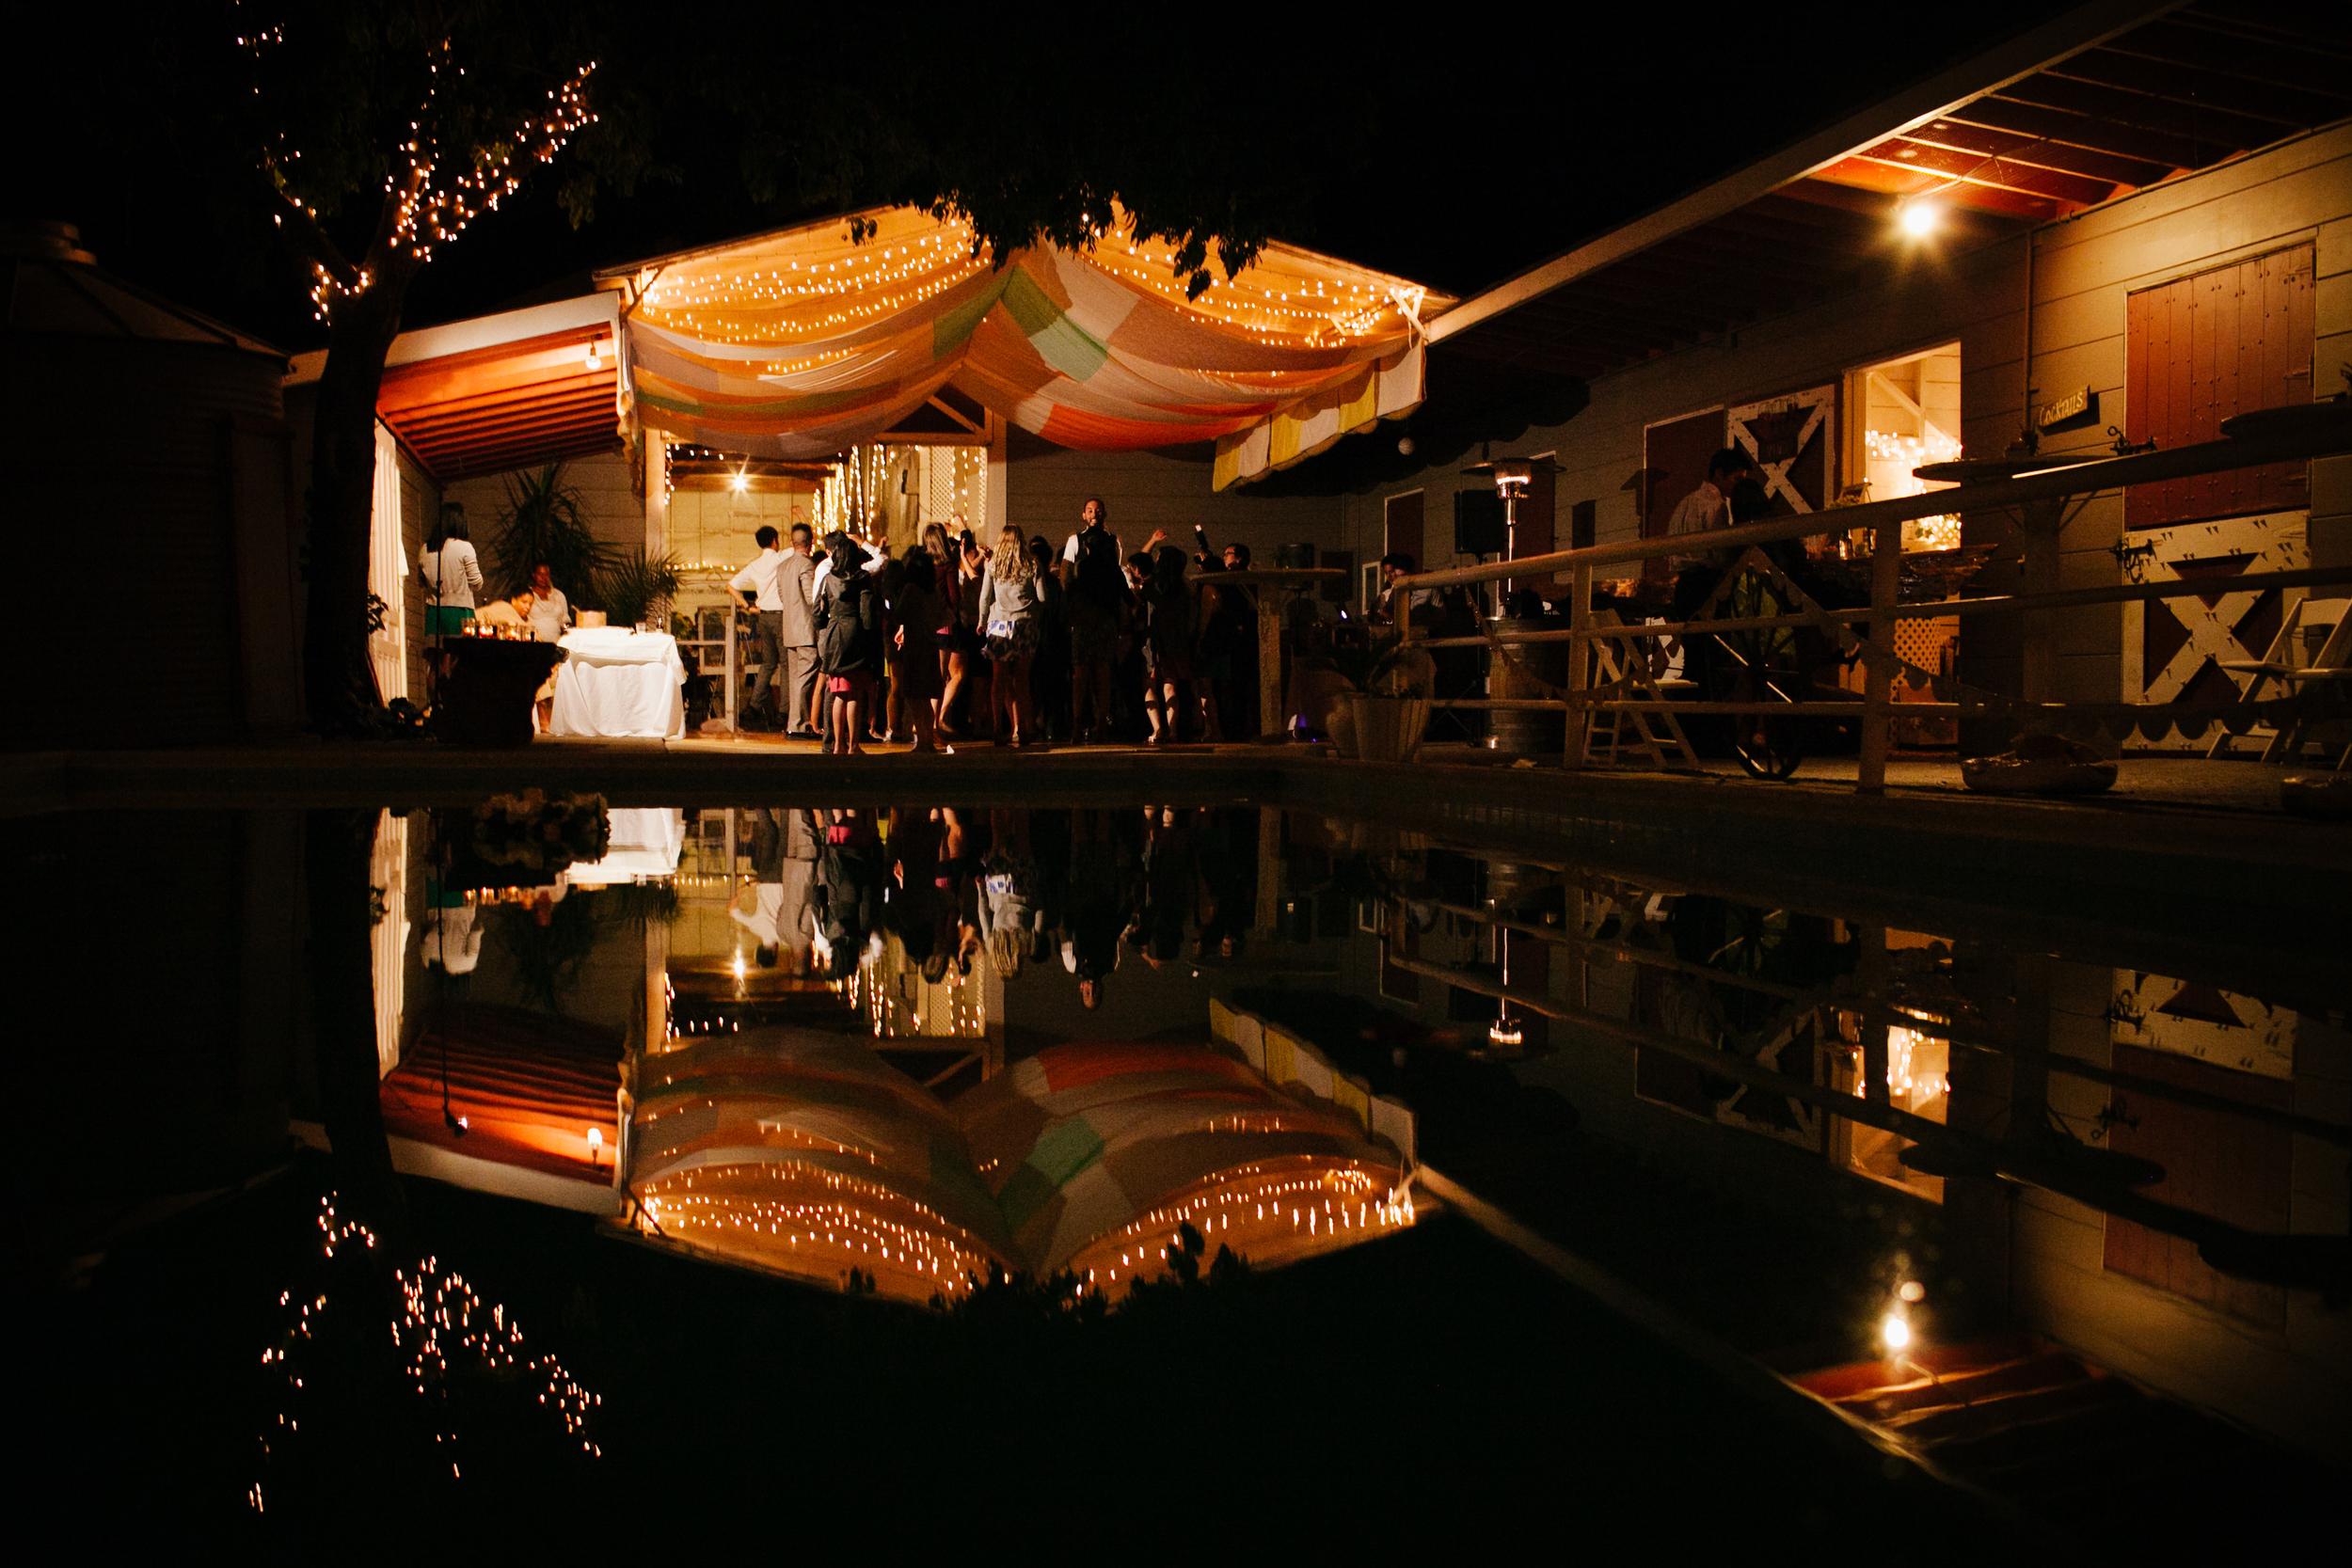 Diablo_Ranch_Wedding_Photography_Becky_Will-36.JPG